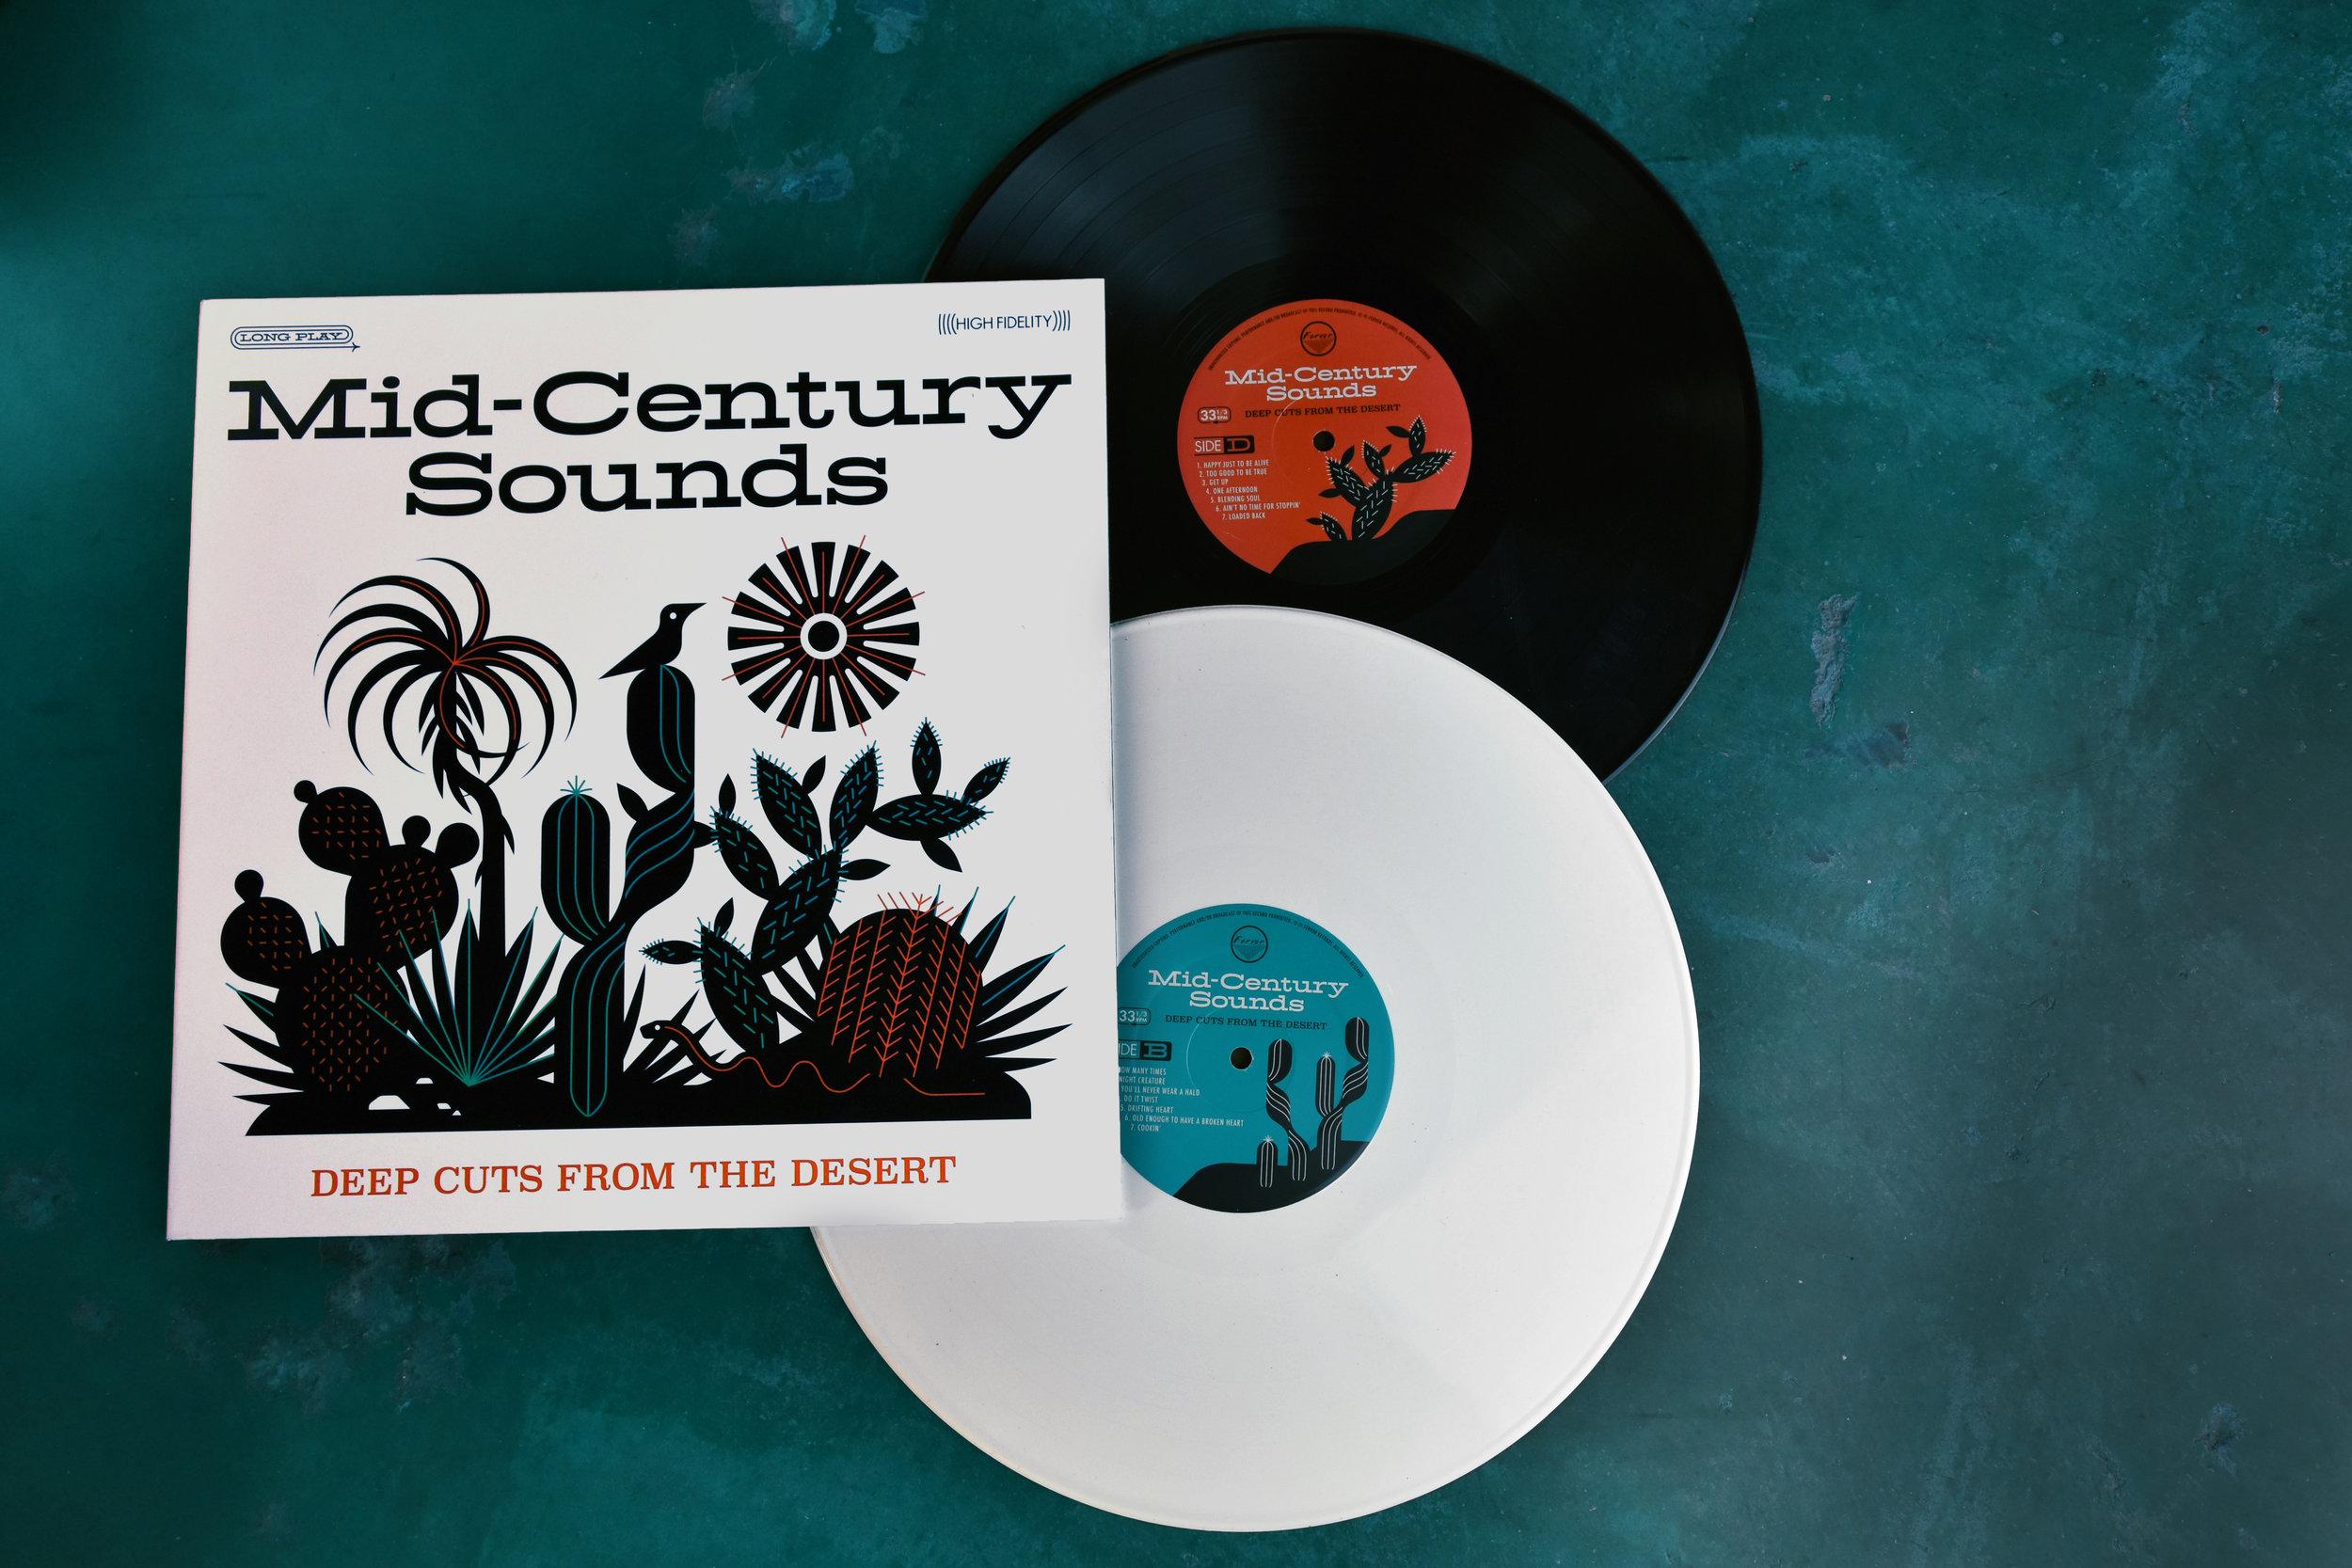 Mid Century Sounds Vinyl Promo 1.jpg